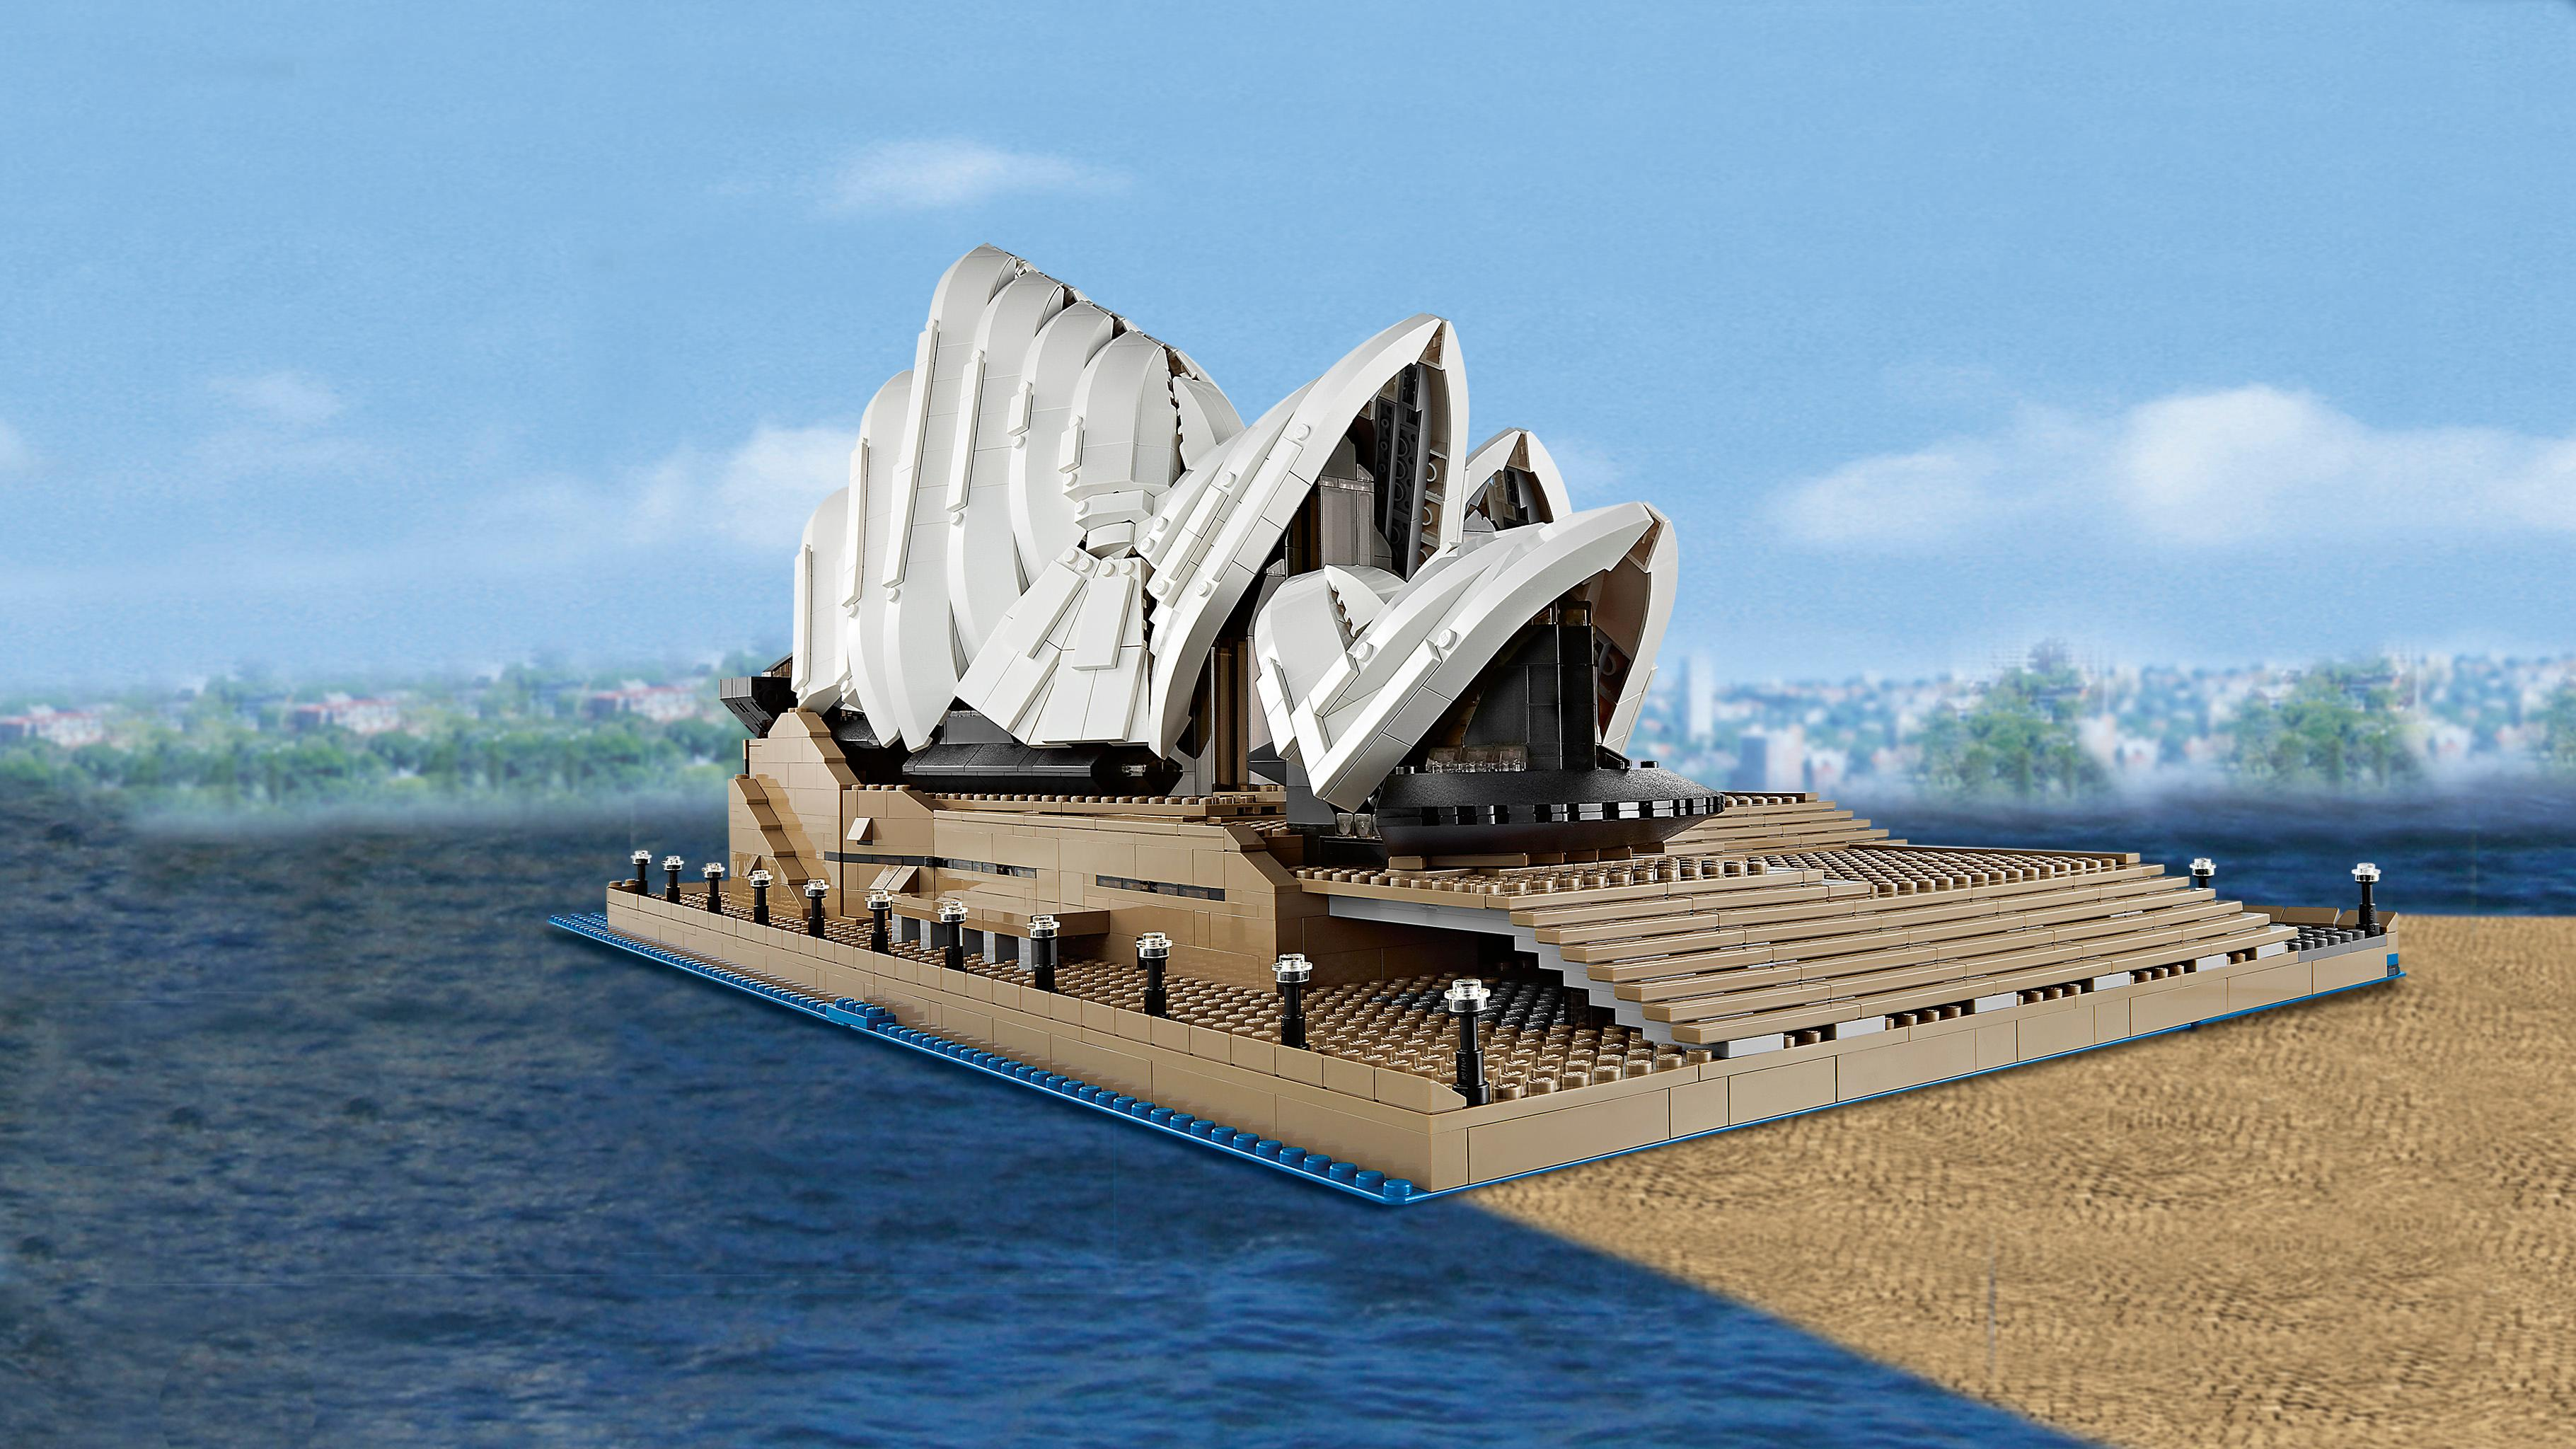 Amazon.com: LEGO Creator Expert 10234 Sydney Opera House: Toys & Games